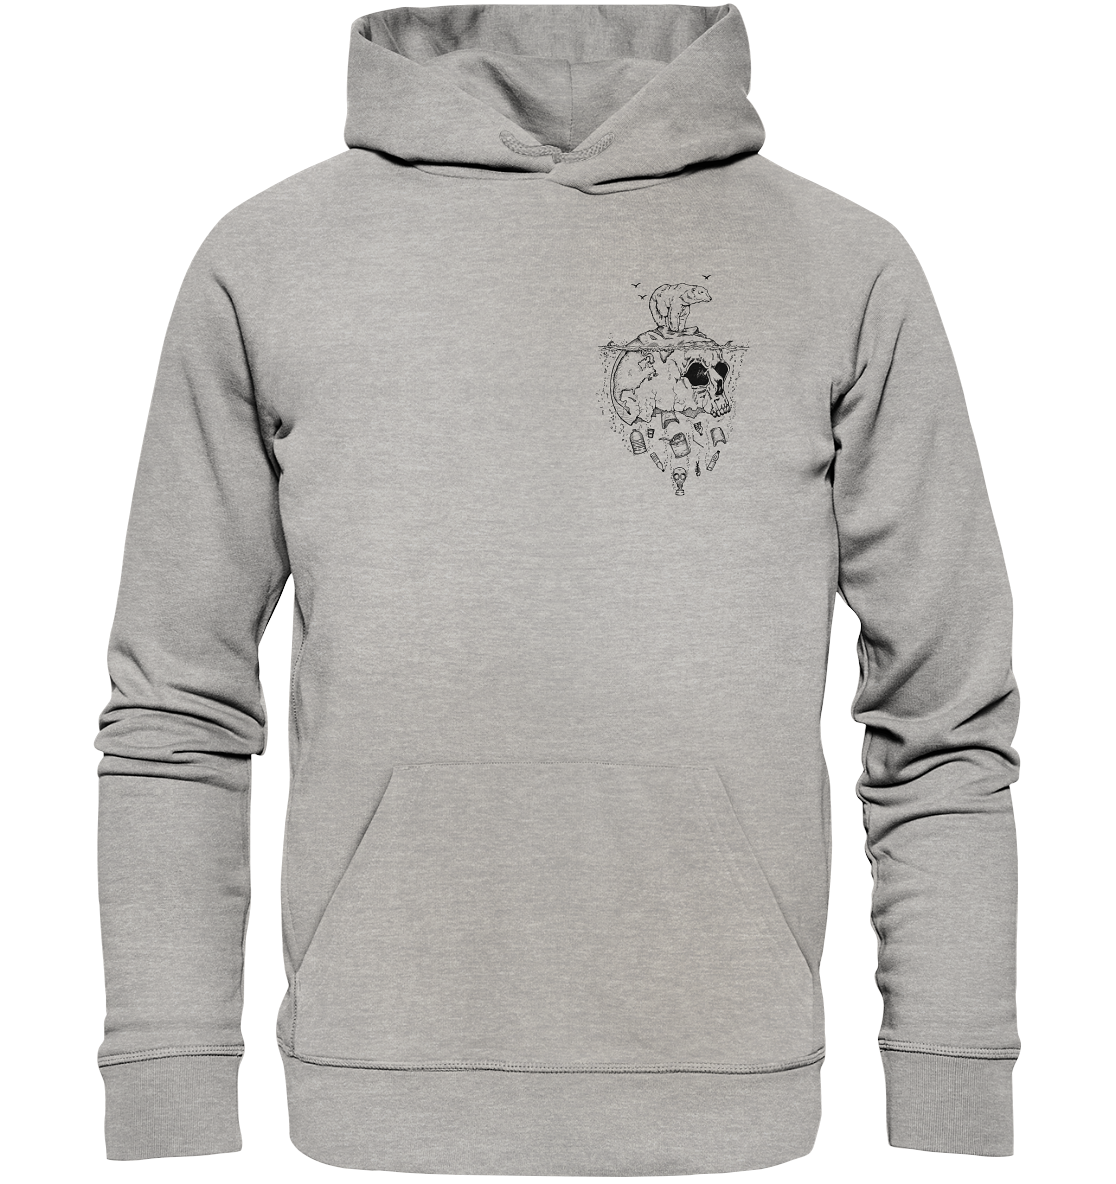 front-organic-hoodie-c2c1c0-1116x-20.png